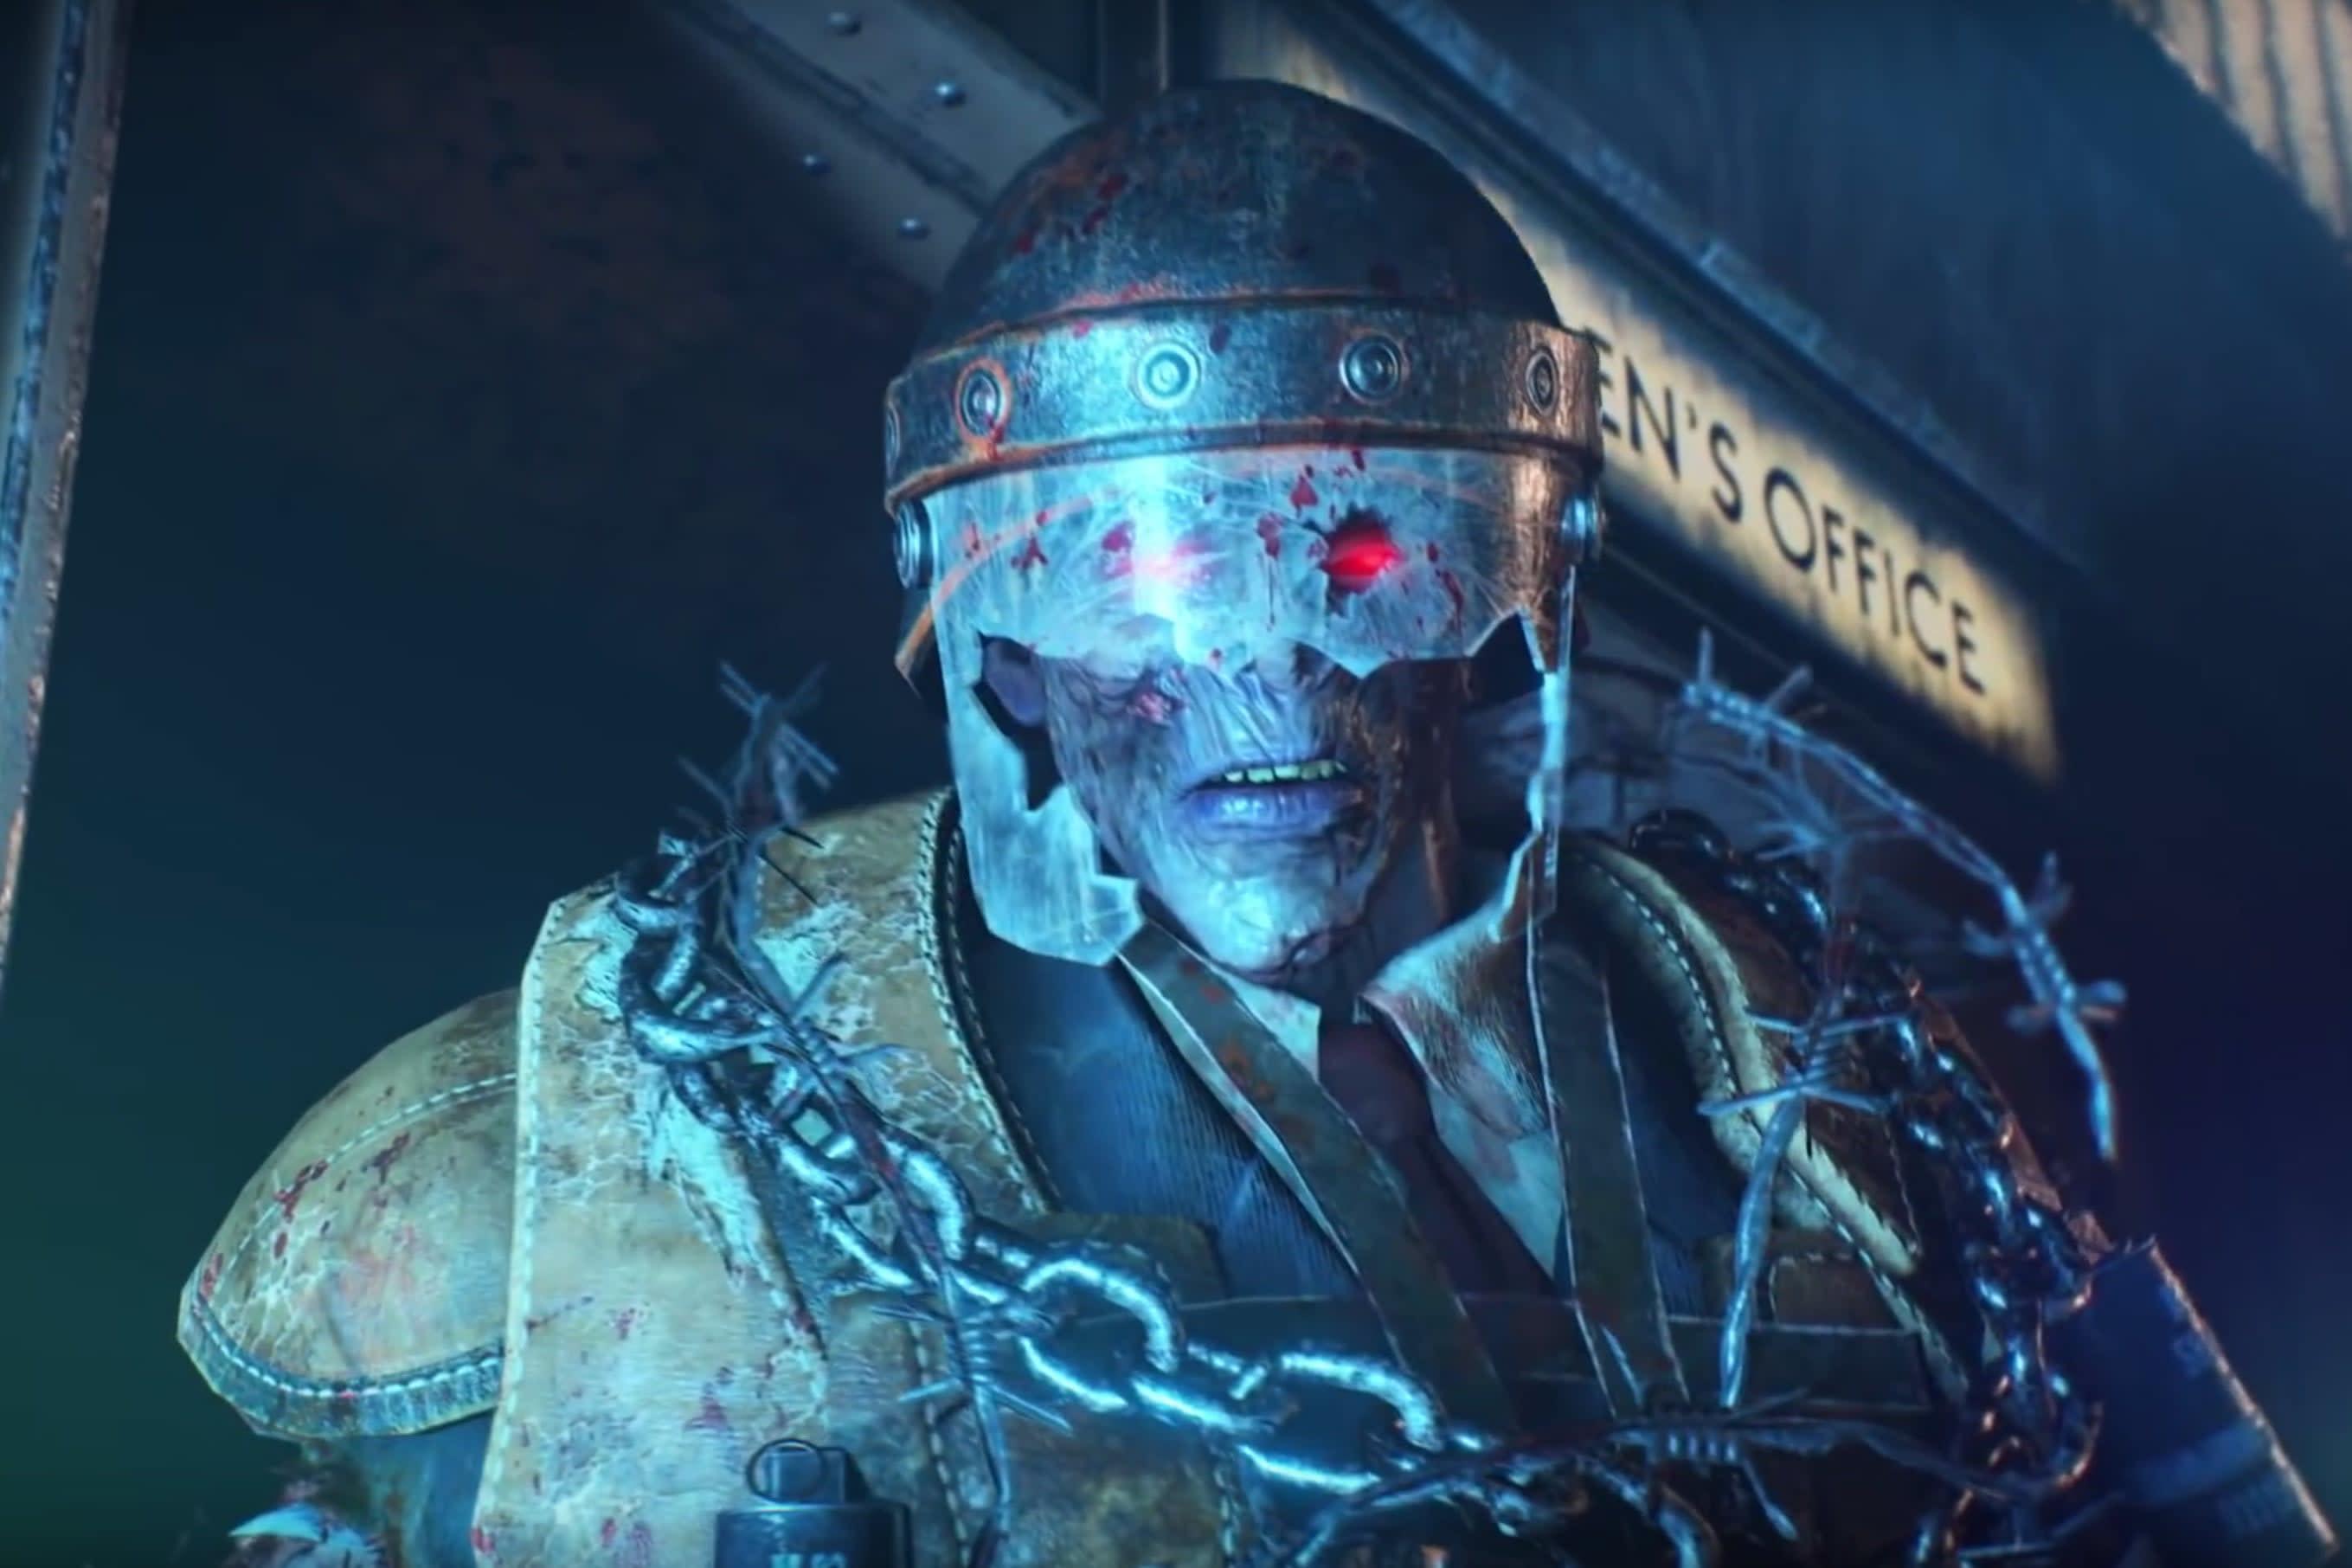 Call Of Duty Black Ops 4 Zombie Story Brings Back Fan Favorites